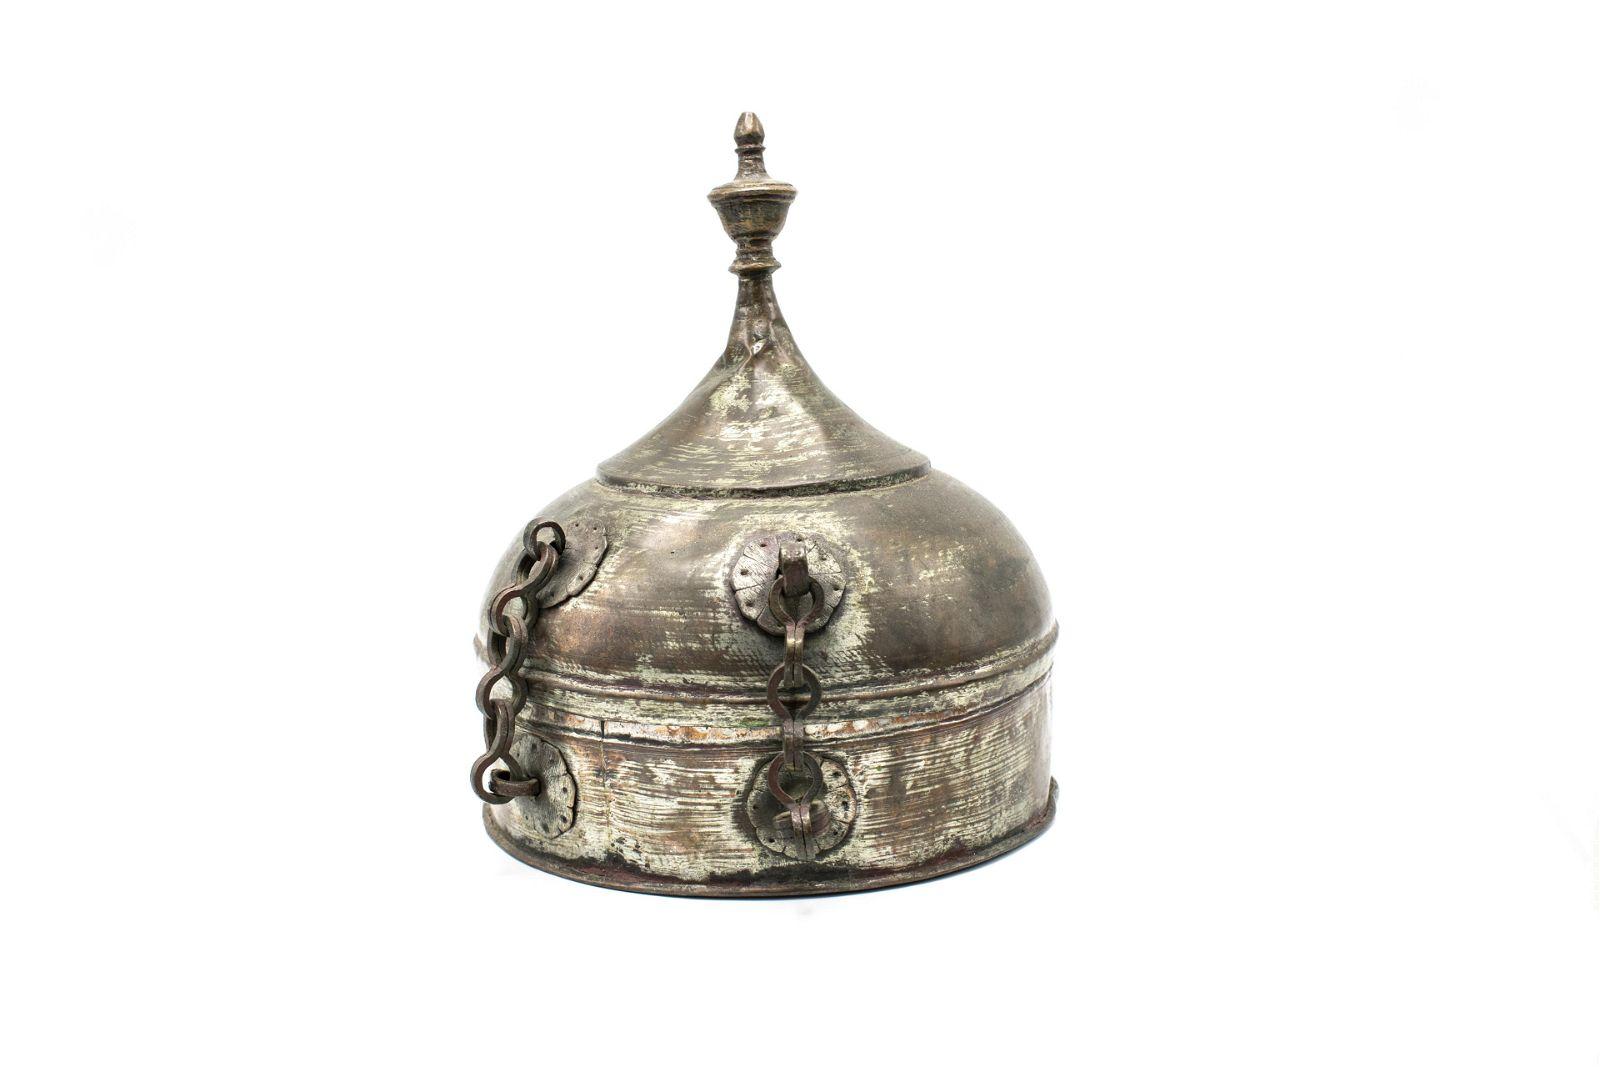 Anatolian/Ottoman Tin-Lined Copper Food Box